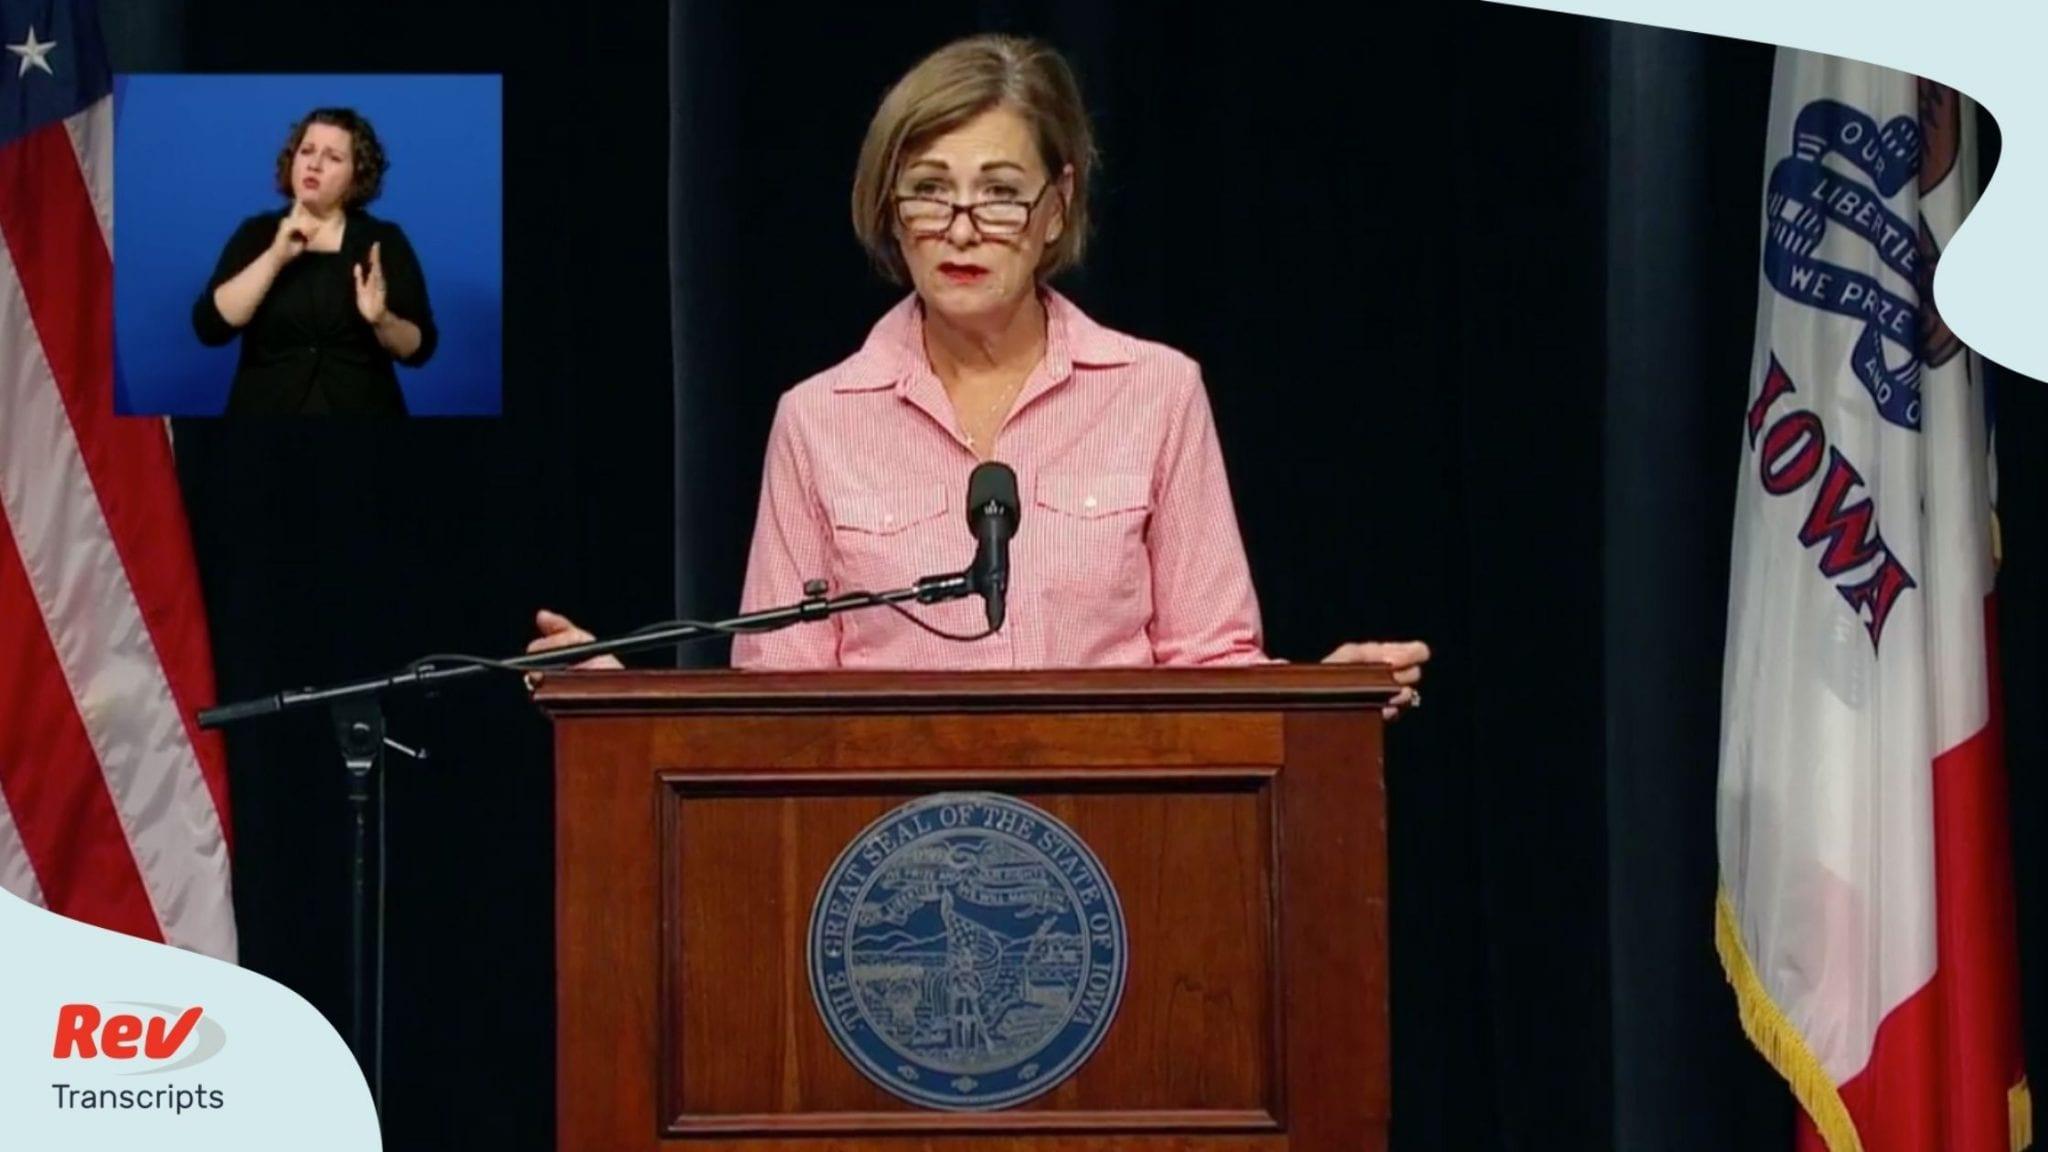 Iowa Governor Kim Reynolds COVID-19 Press Conference Transcript August 11